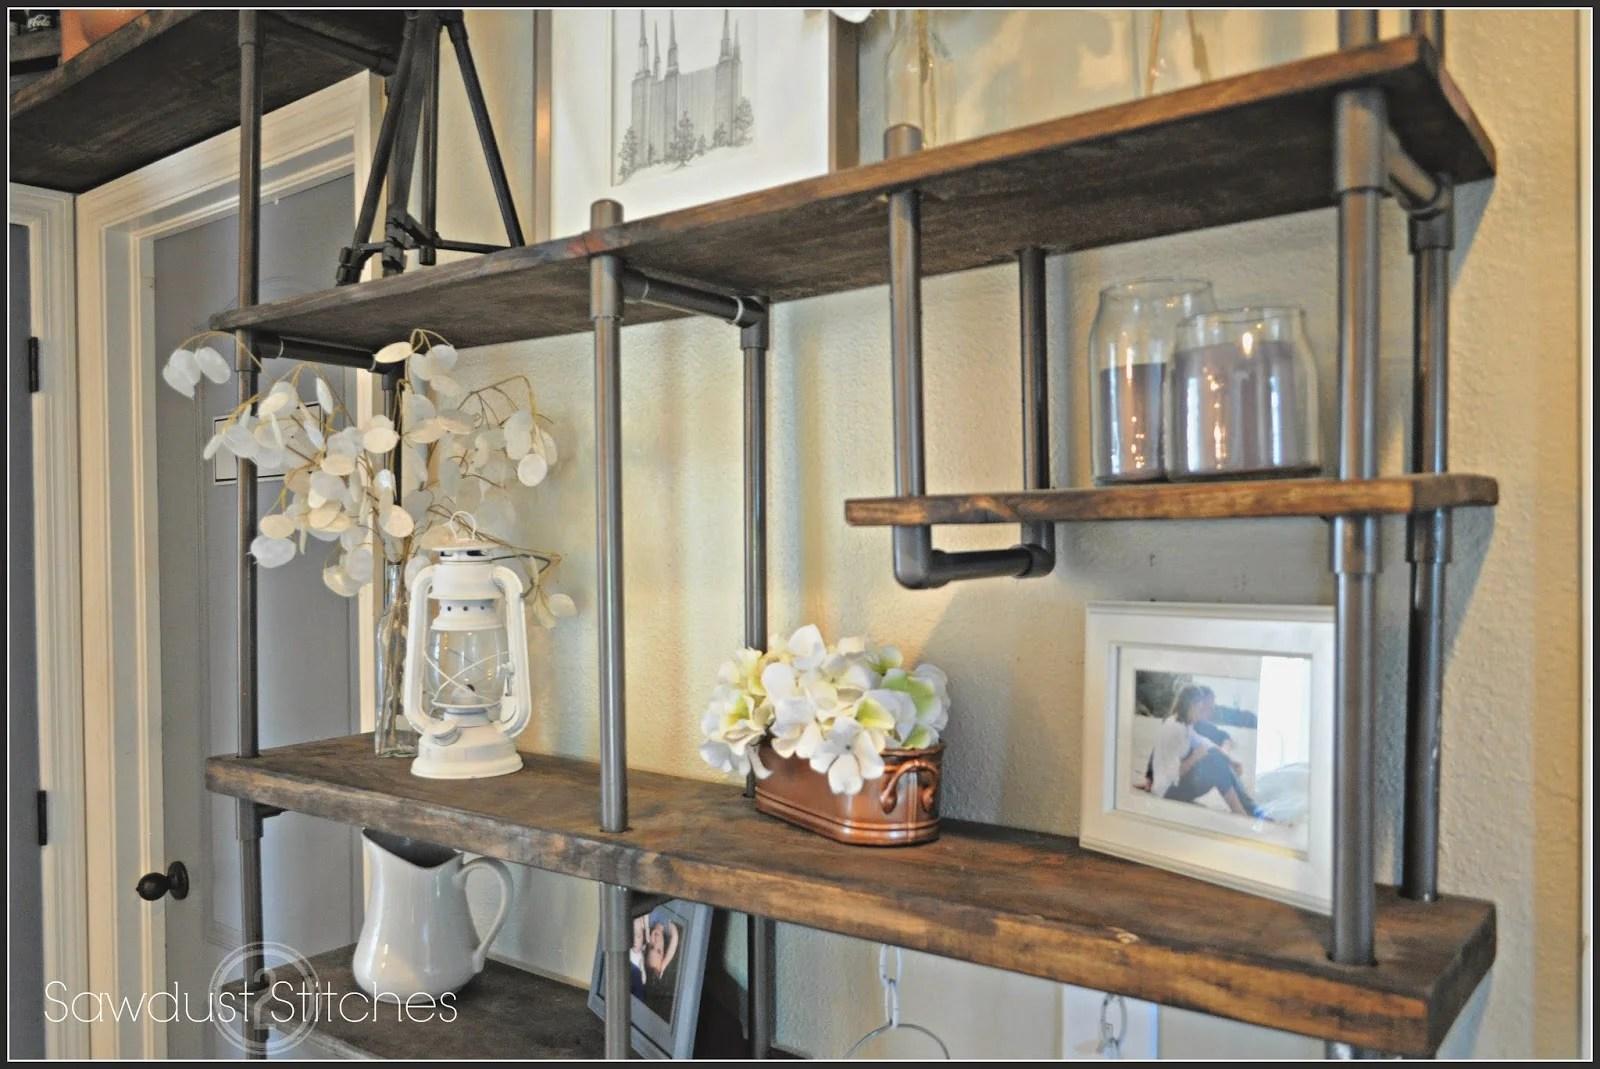 Fresh Remodelaholic | Build a Budget-Friendly Industrial Shelf Using PVC  ND33